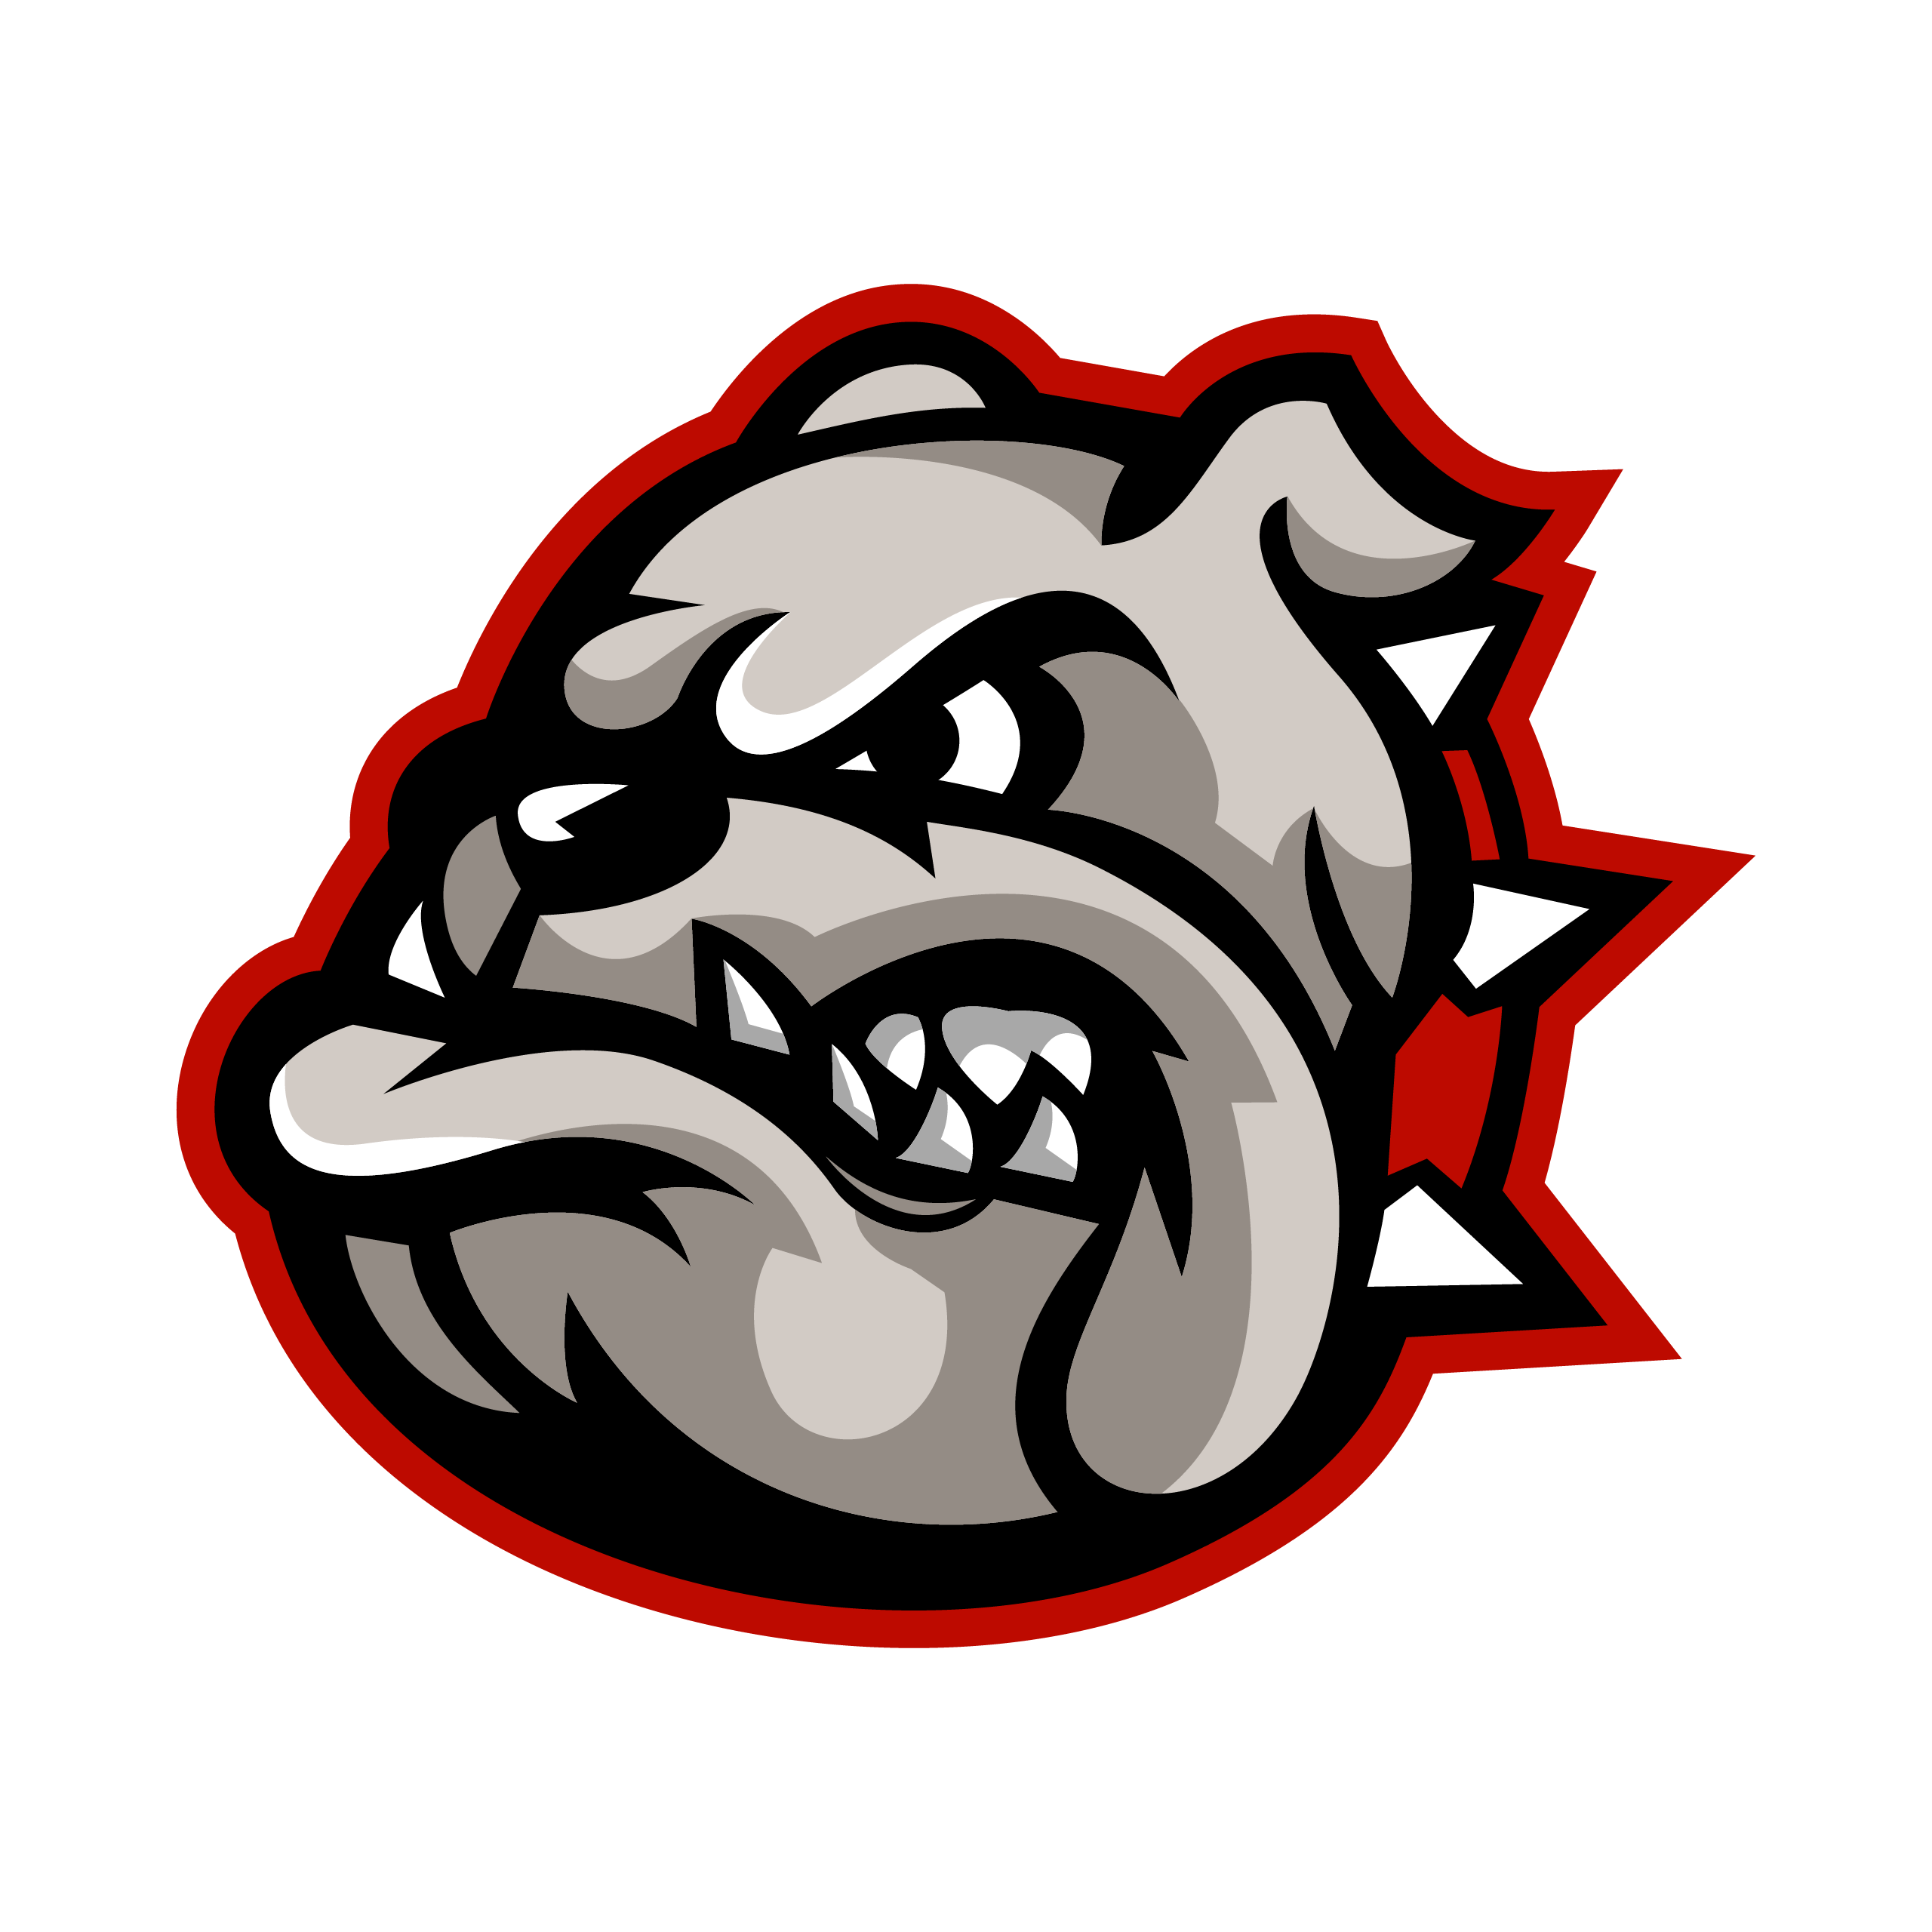 Bulldog logo for boccia team